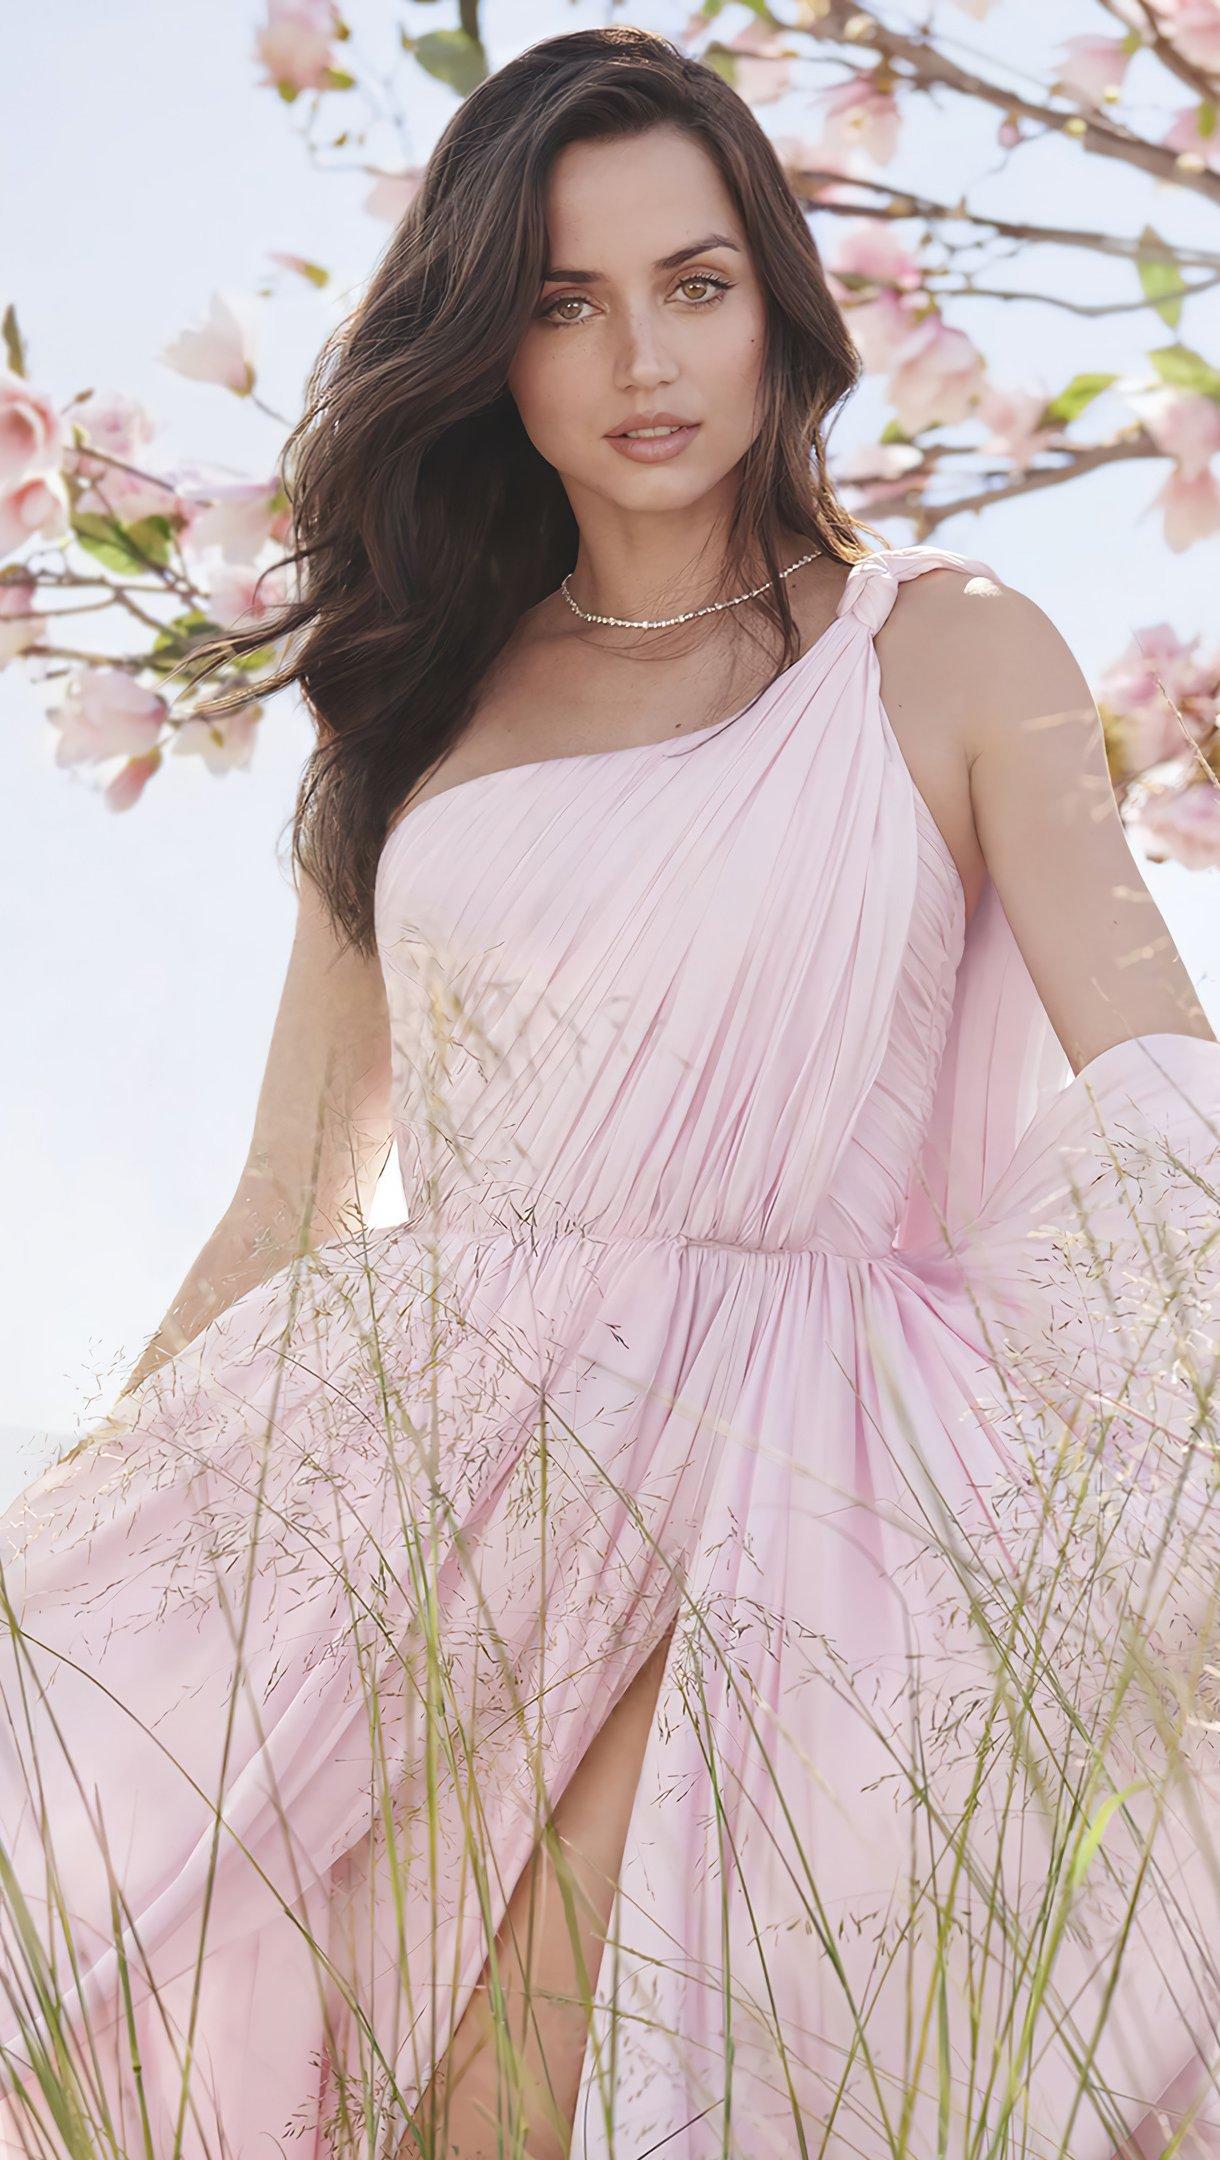 Wallpaper Ana de armas pink dress in the countryside Vertical